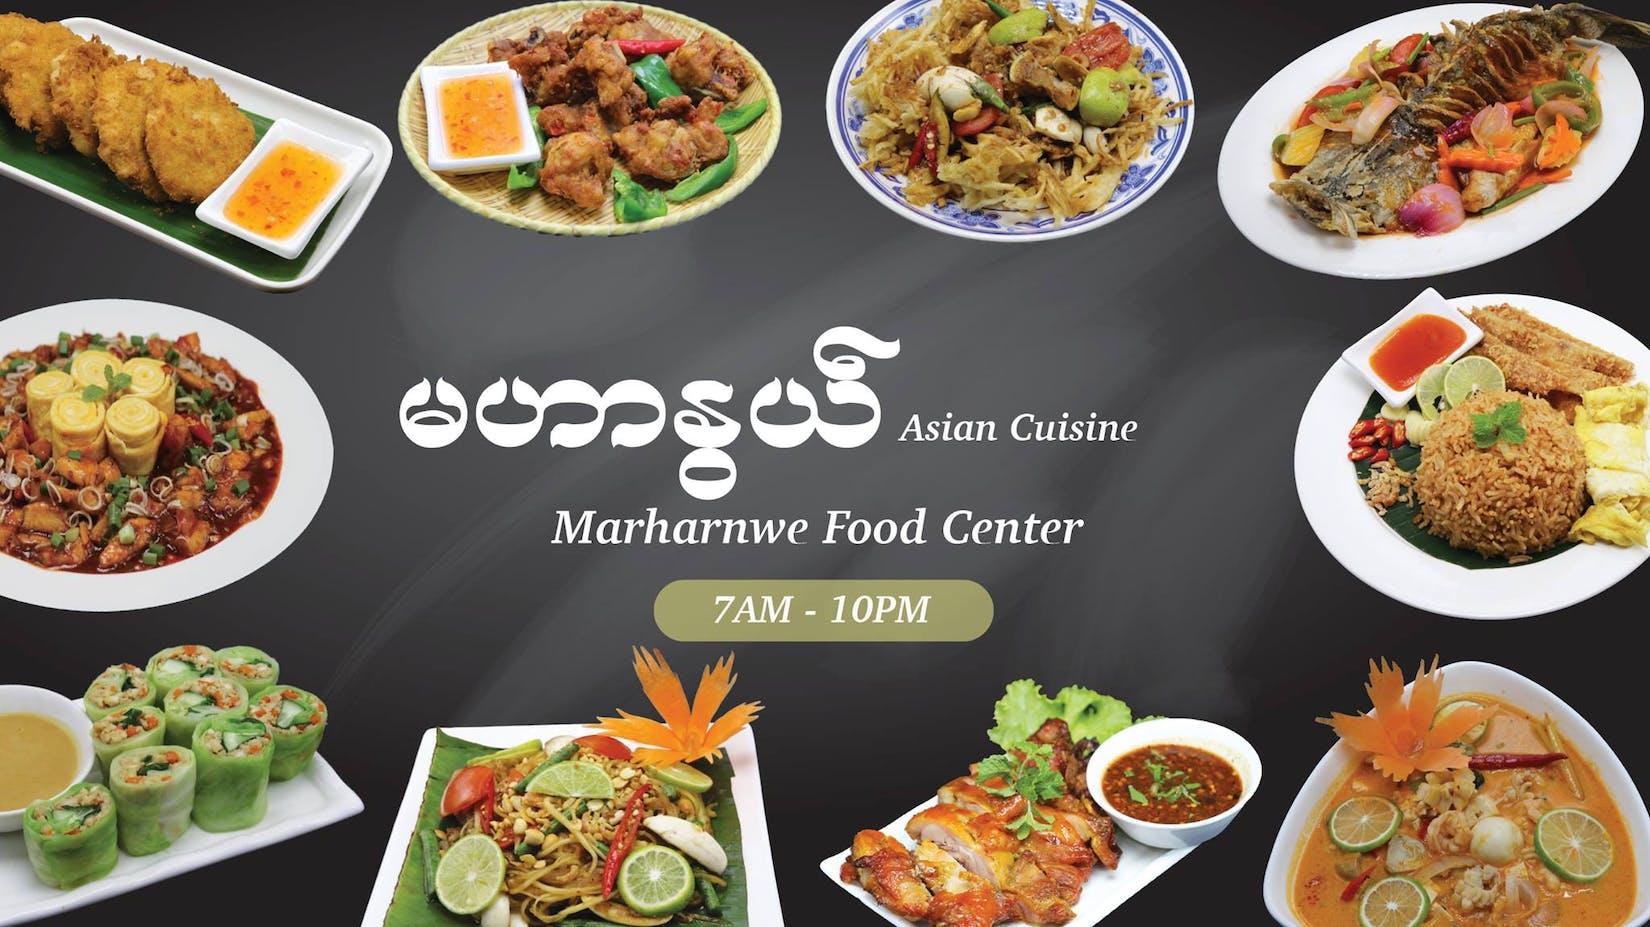 Mahar Nwe Food Center | yathar